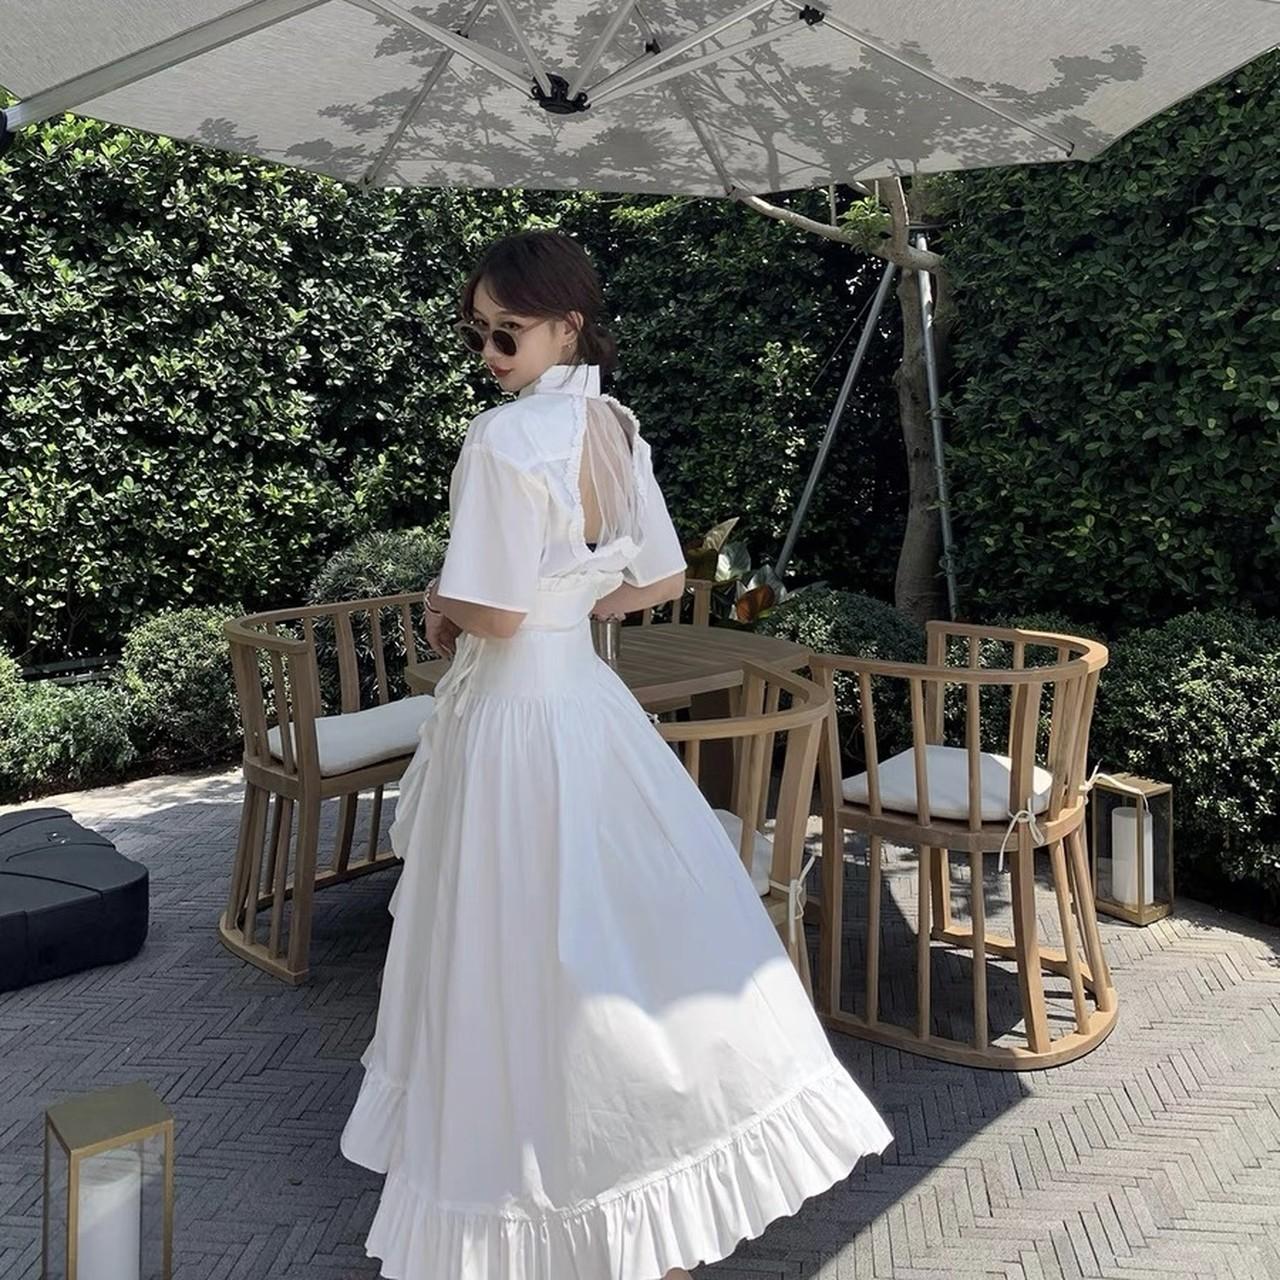 white dress set up